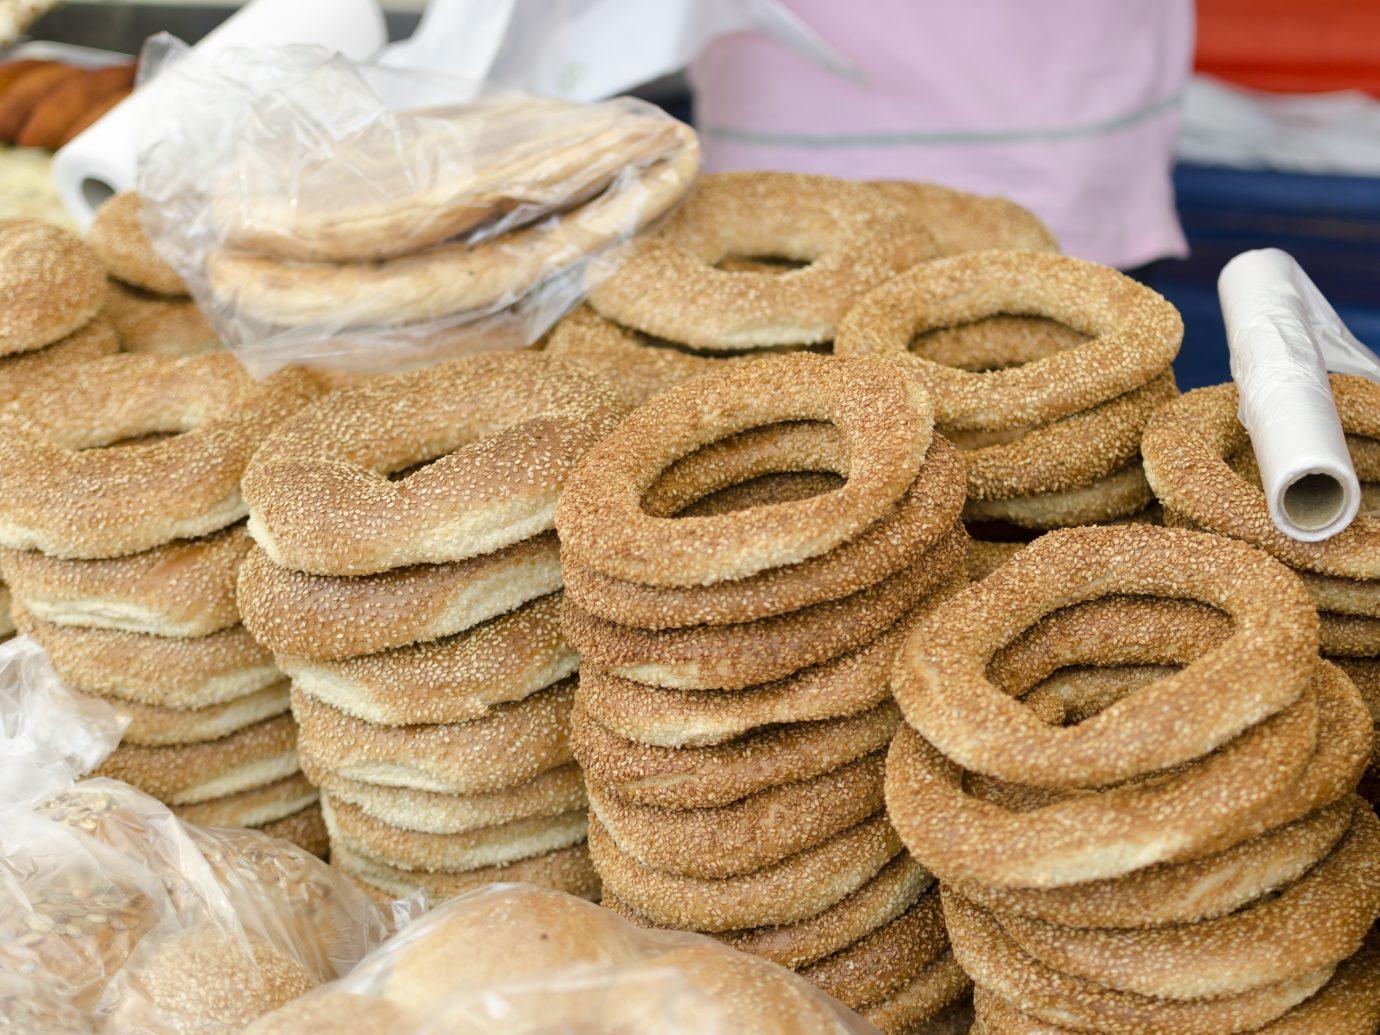 Turkish bagel (simit) sold on a marketplace in Kreuzberg, Berlin.